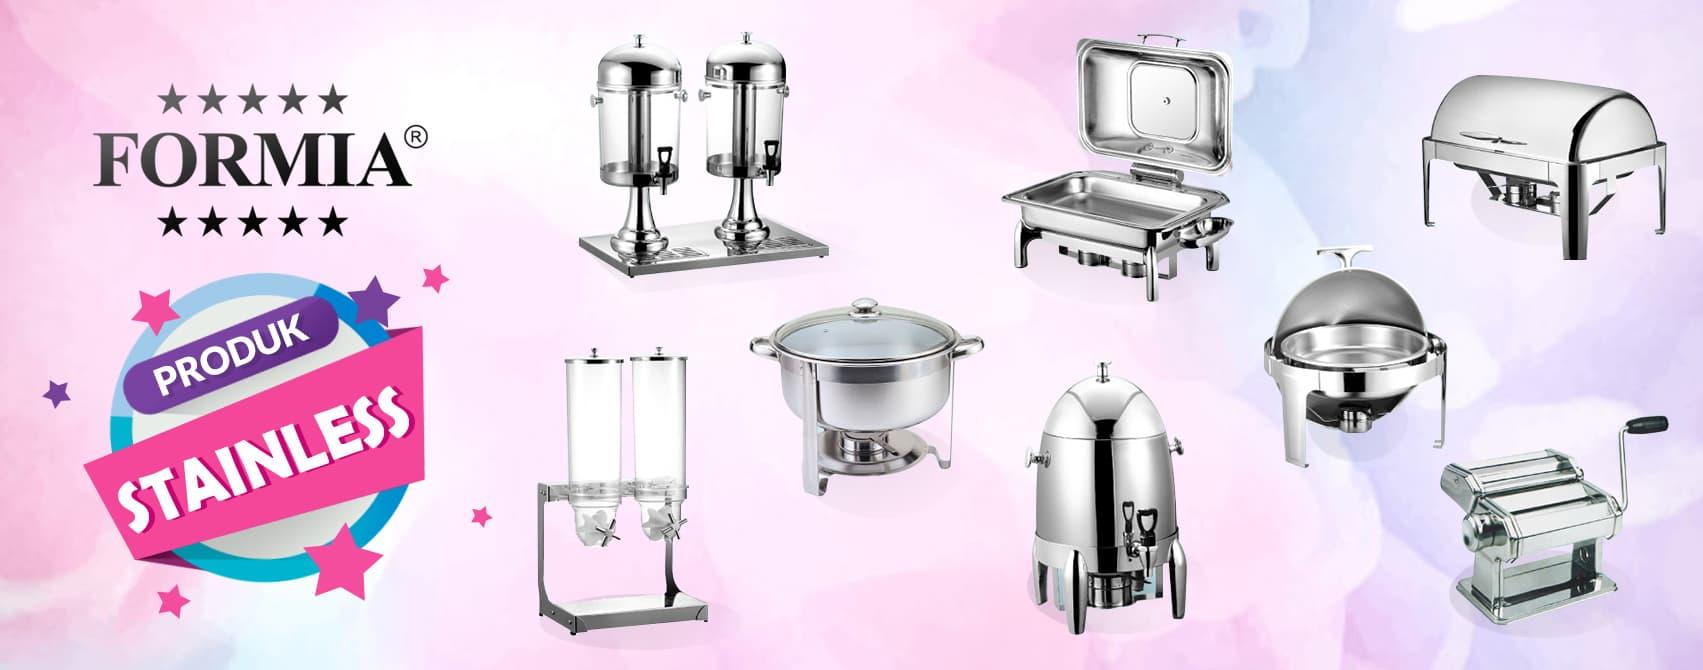 perlengkapan dapur stainless